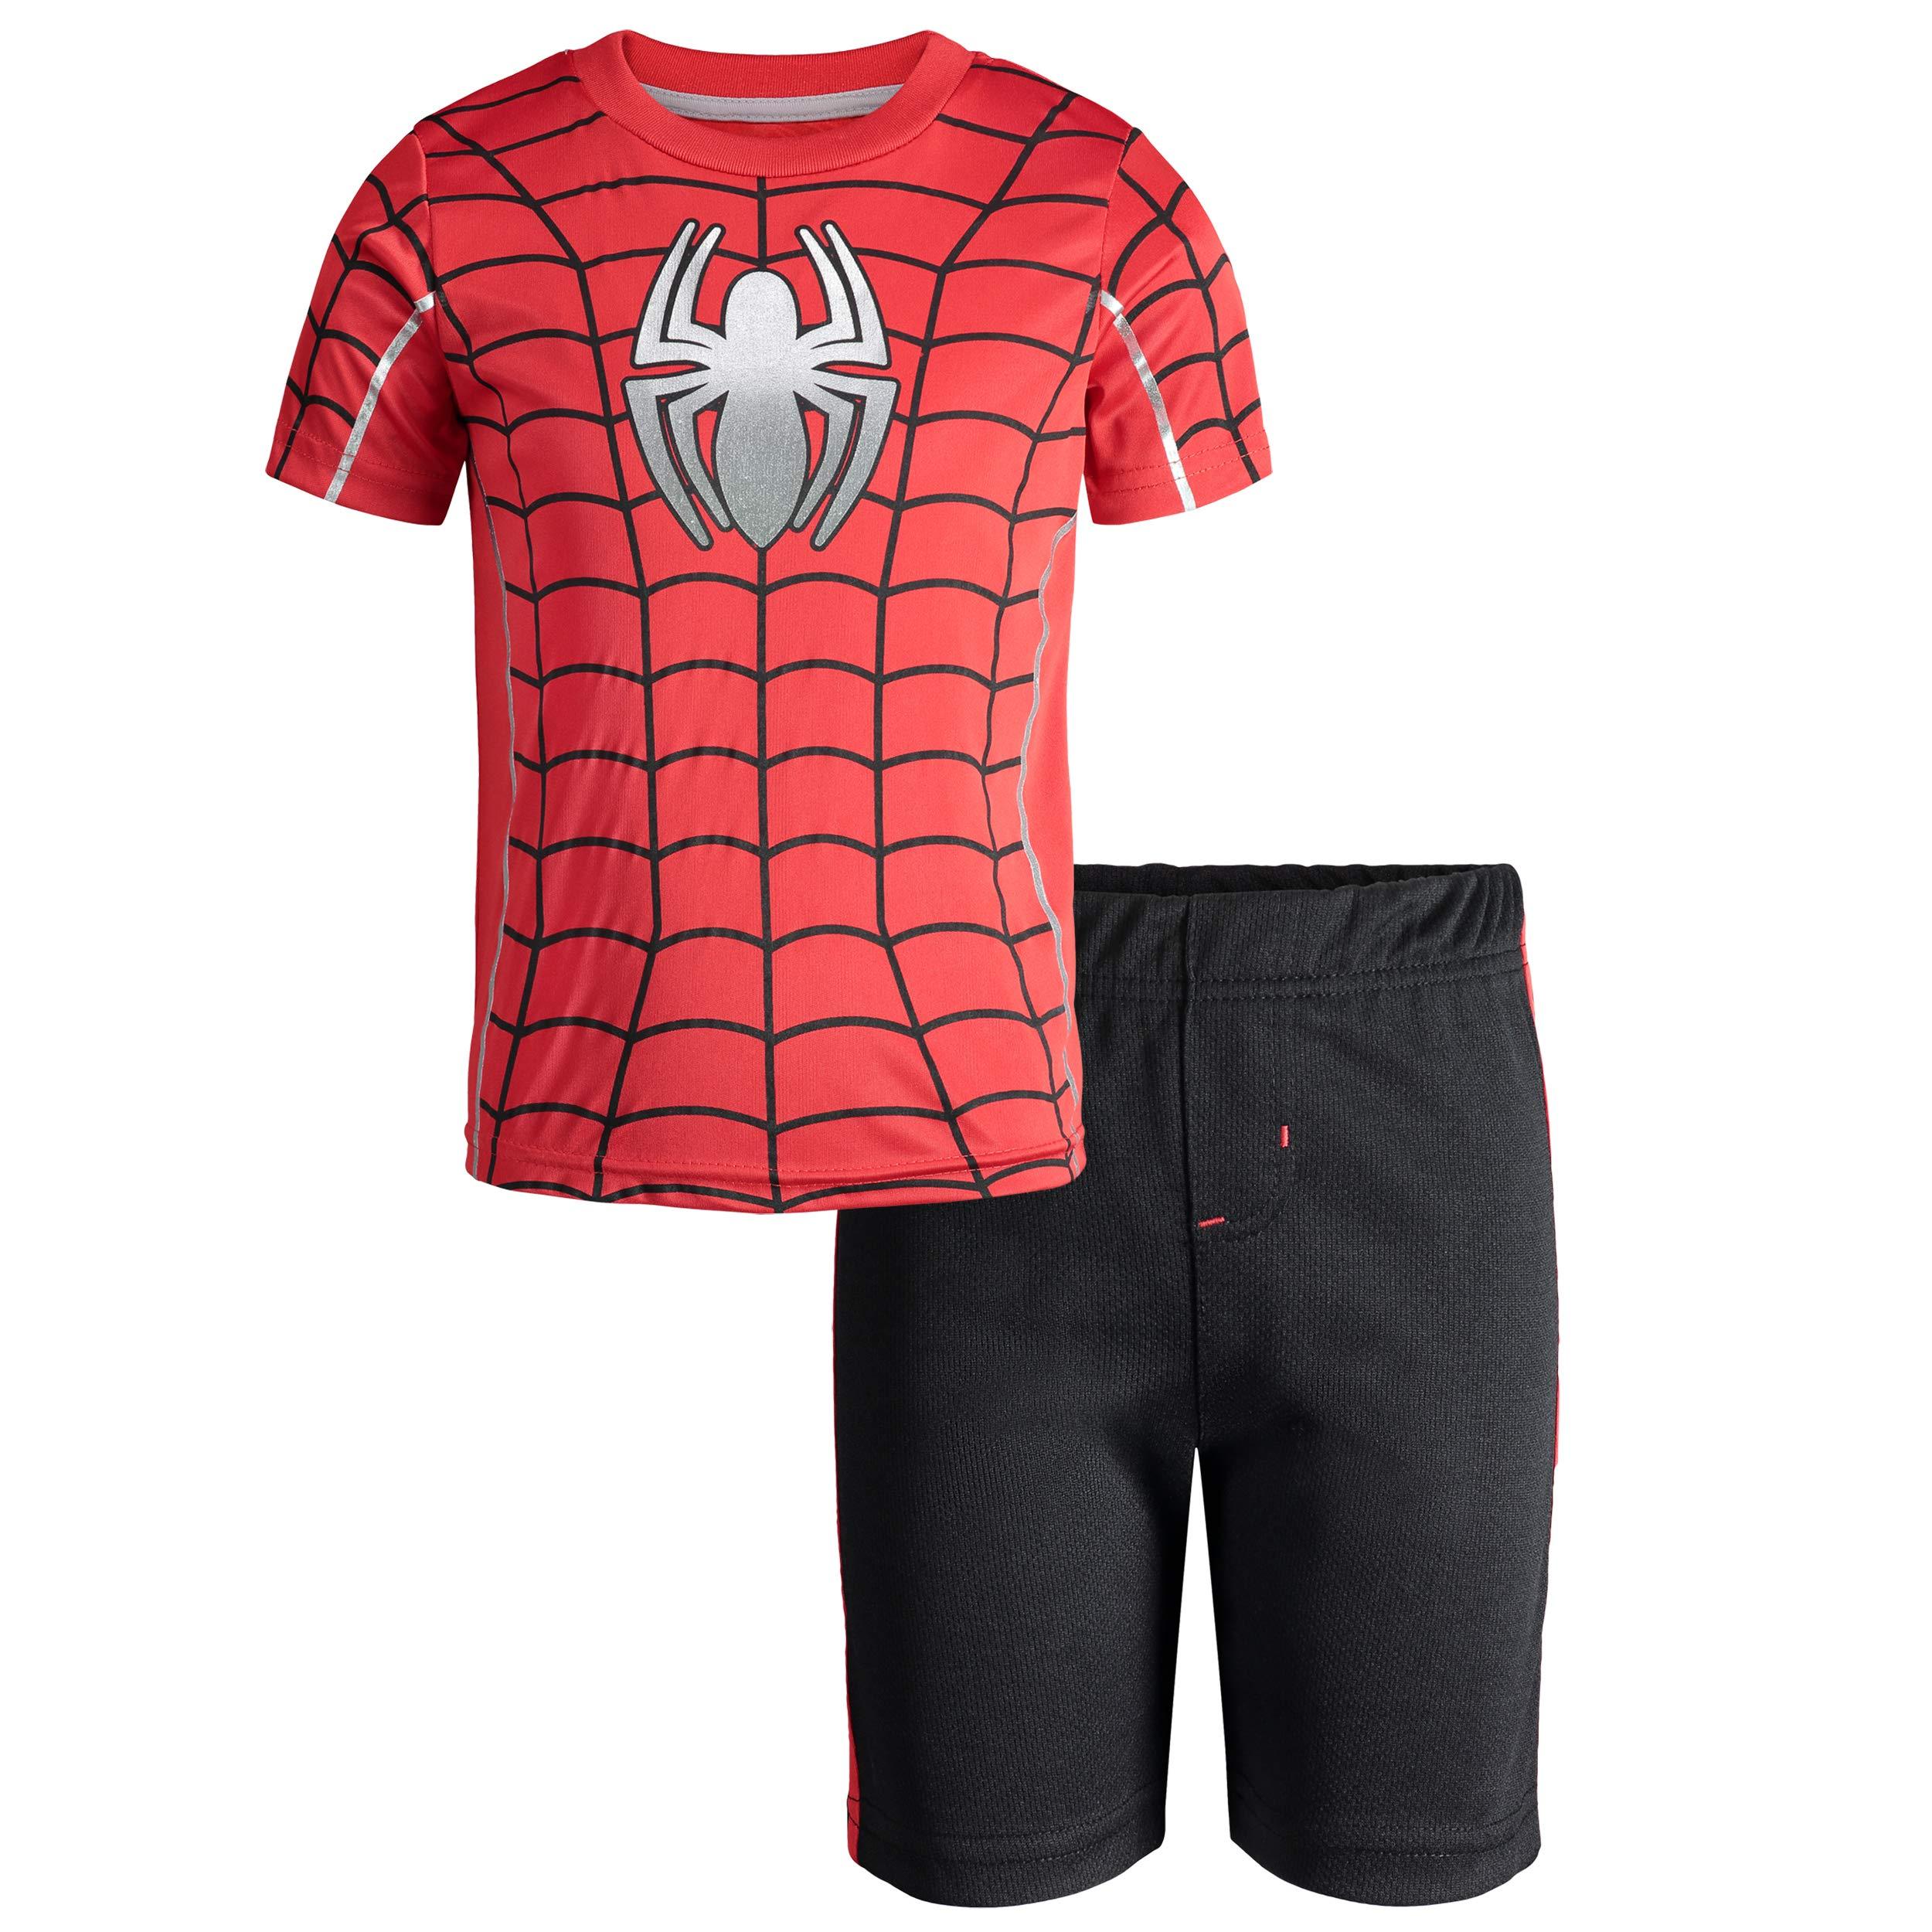 Marvel Avengers Spiderman Toddler Boys' Athletic T-Shirt & Mesh Shorts Set, Red (4T)